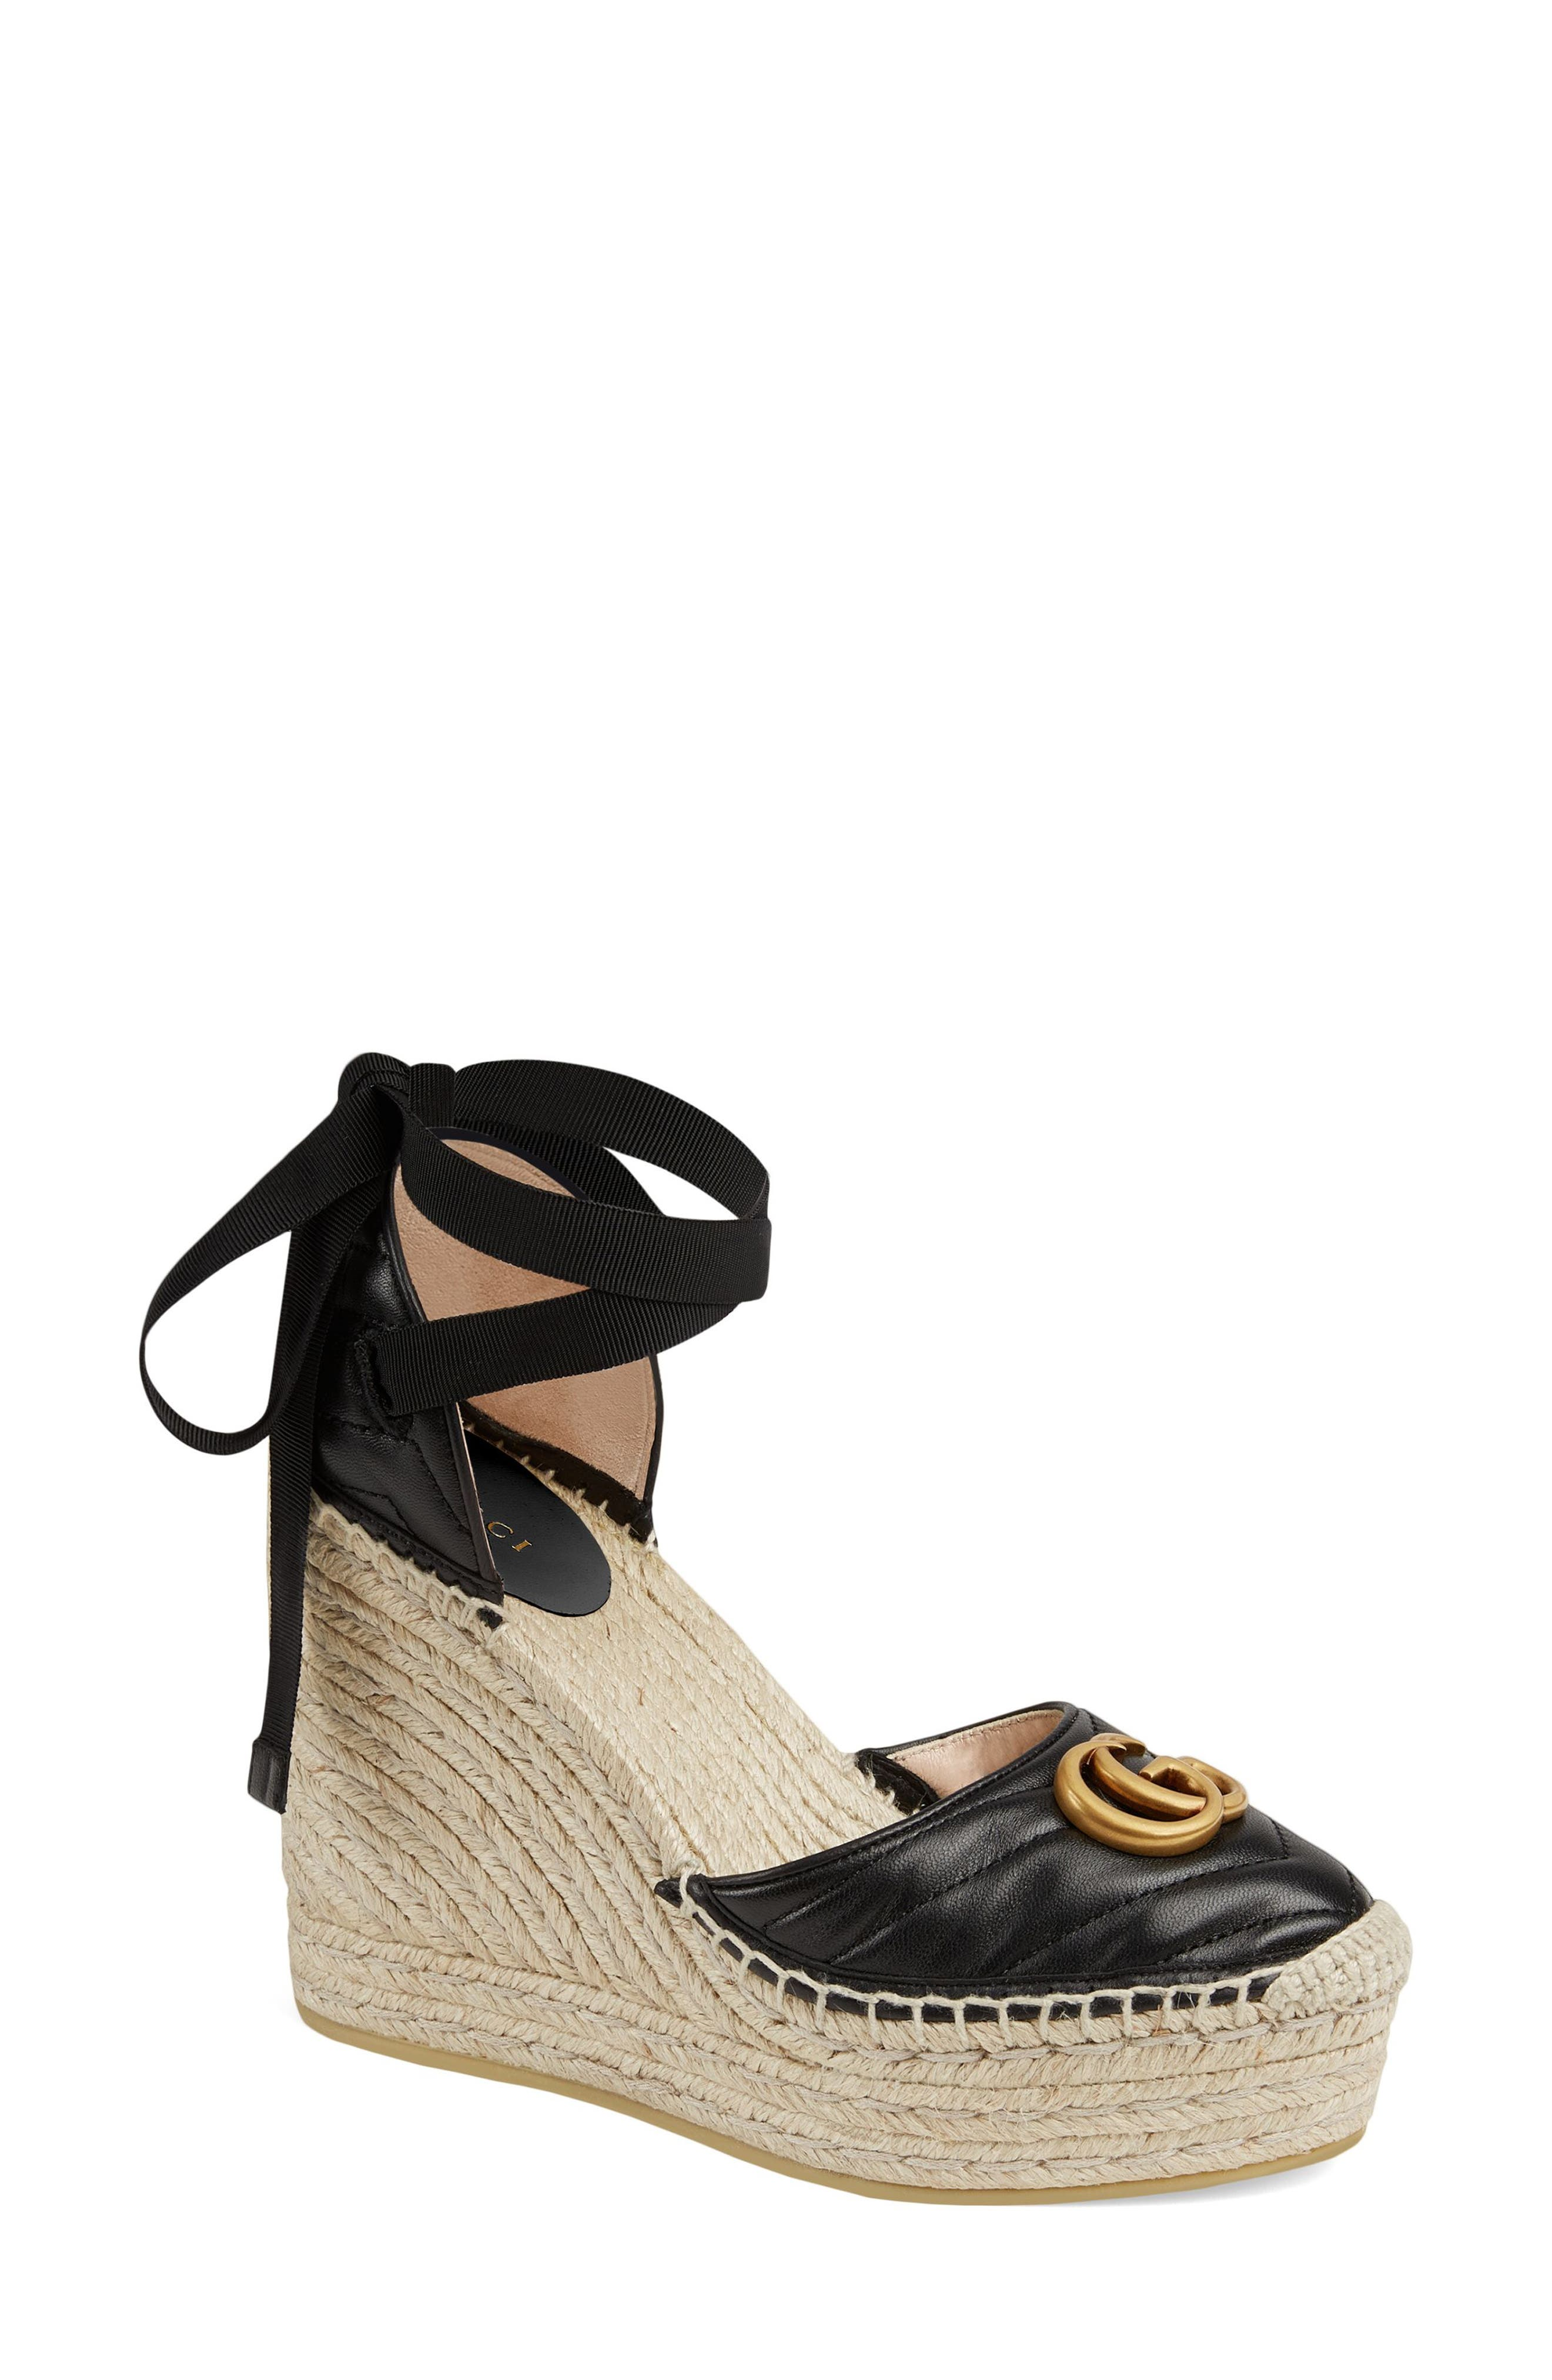 Gucci Palmyra Ankle Tie Espadrille Wedge, Black